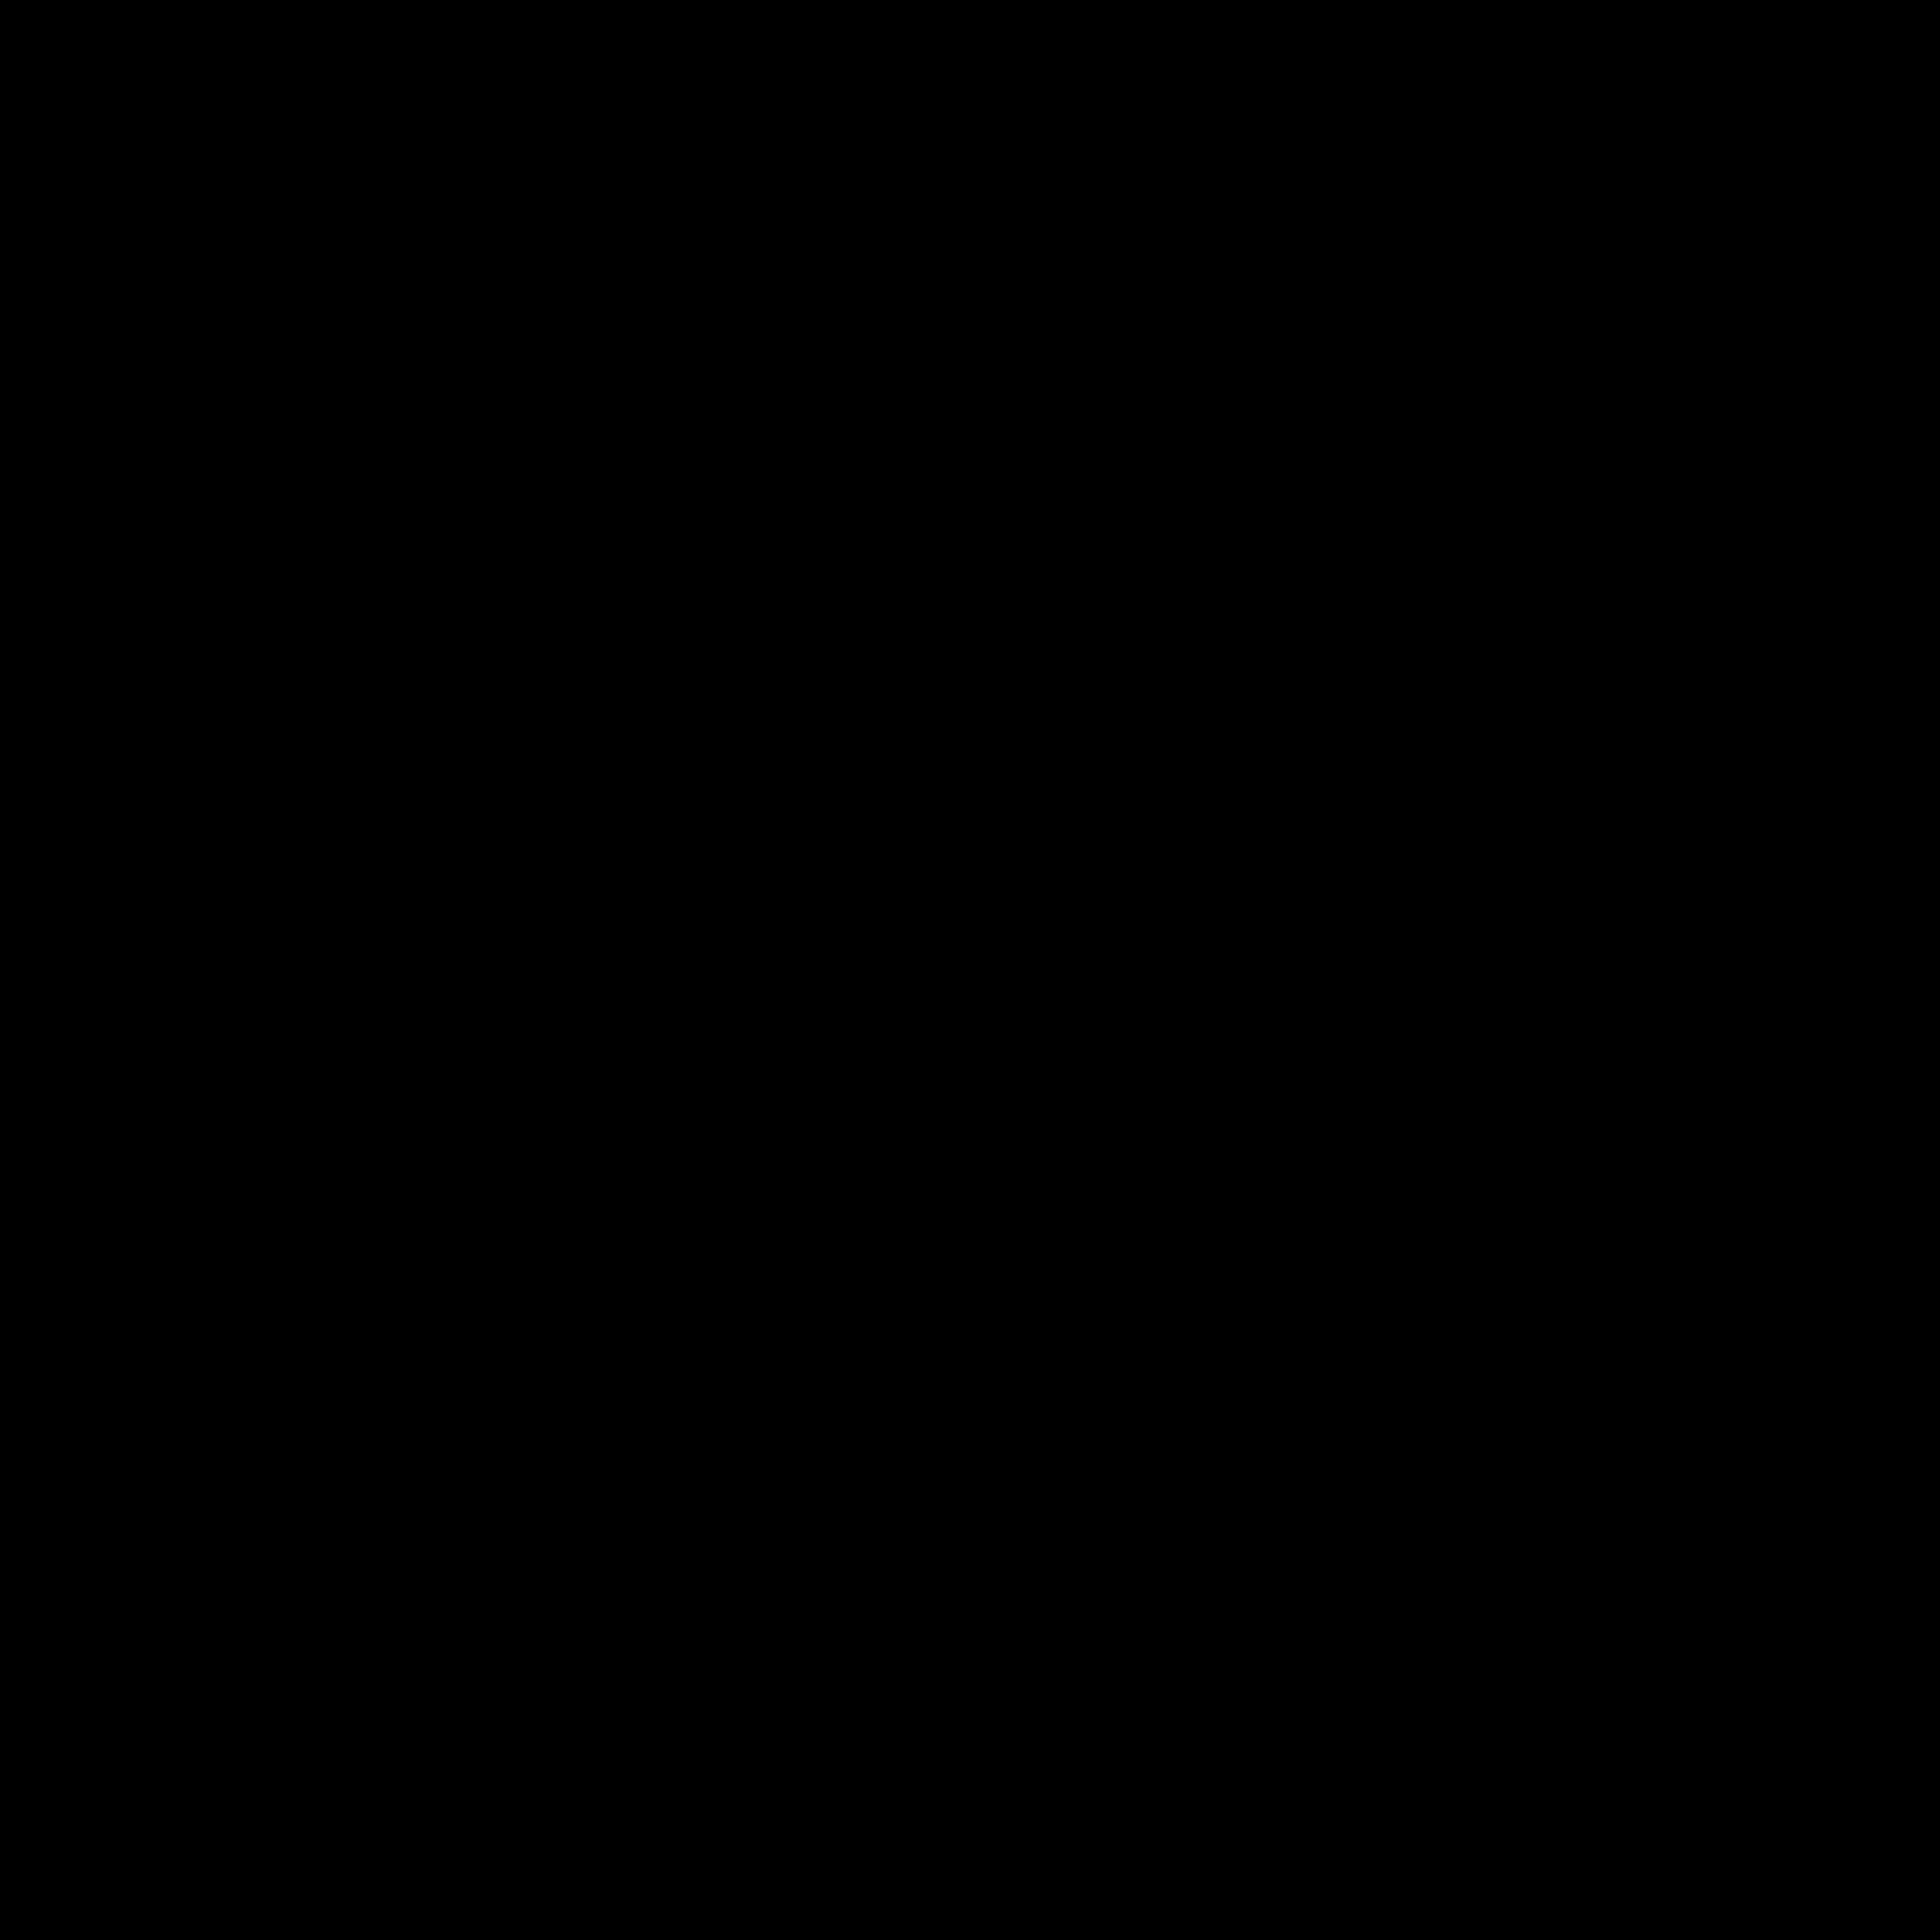 file2-2